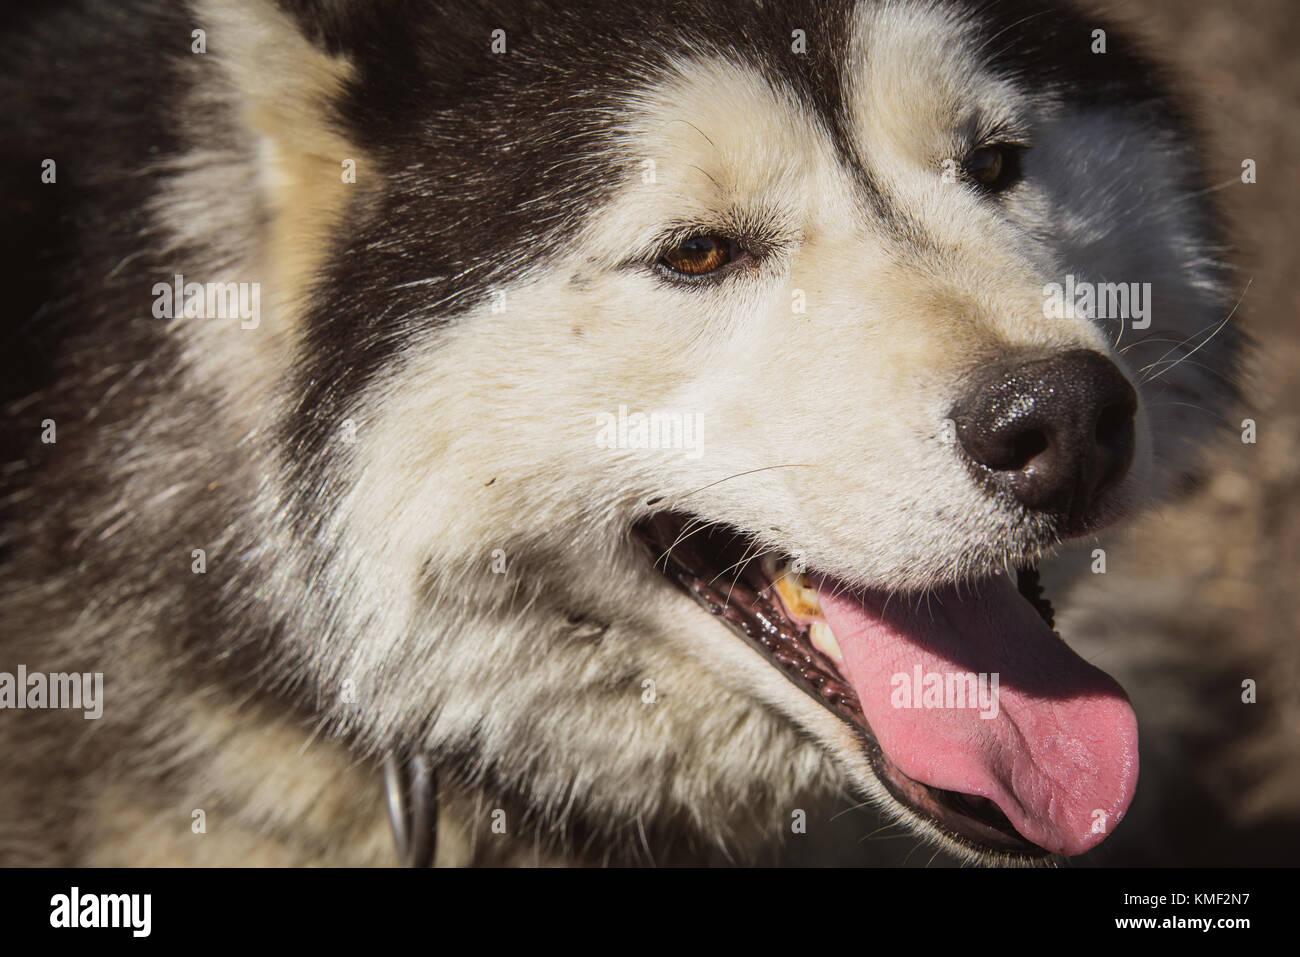 Siberian husky dog smiling in the summer - Stock Image